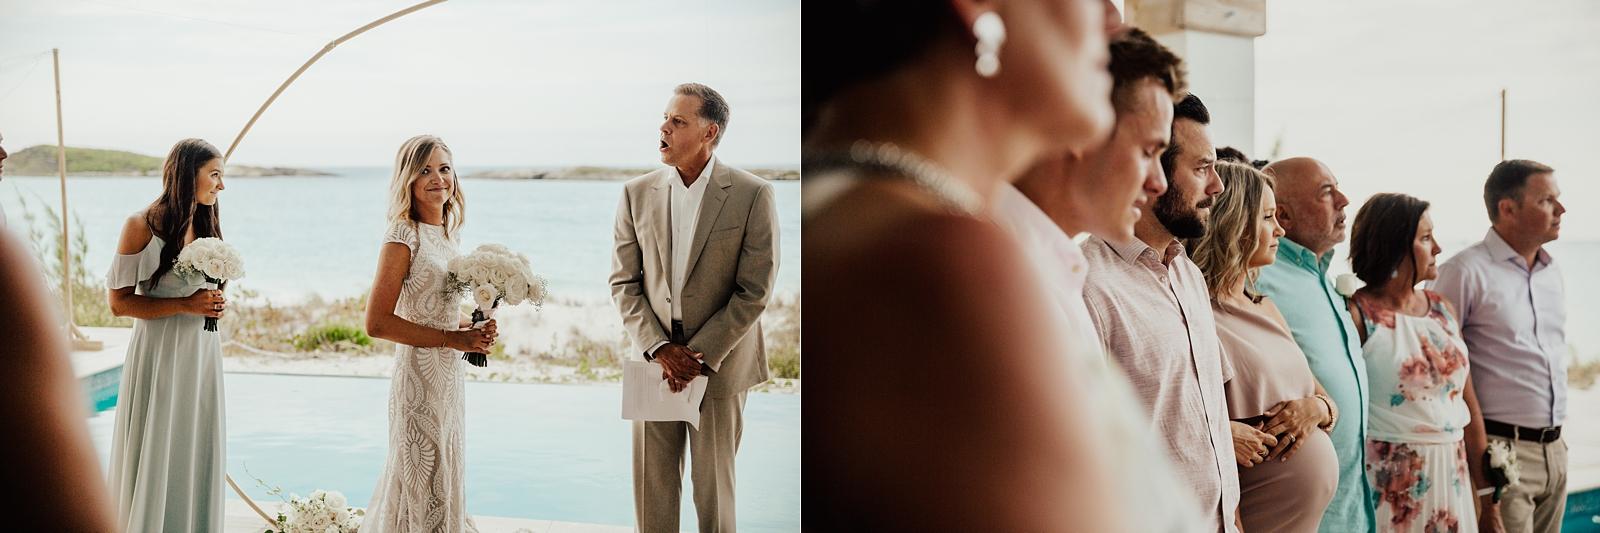 Jenni & Andrew Intimate Beach Destination Wedding in Little Exuma, Bahamas_0505.jpg